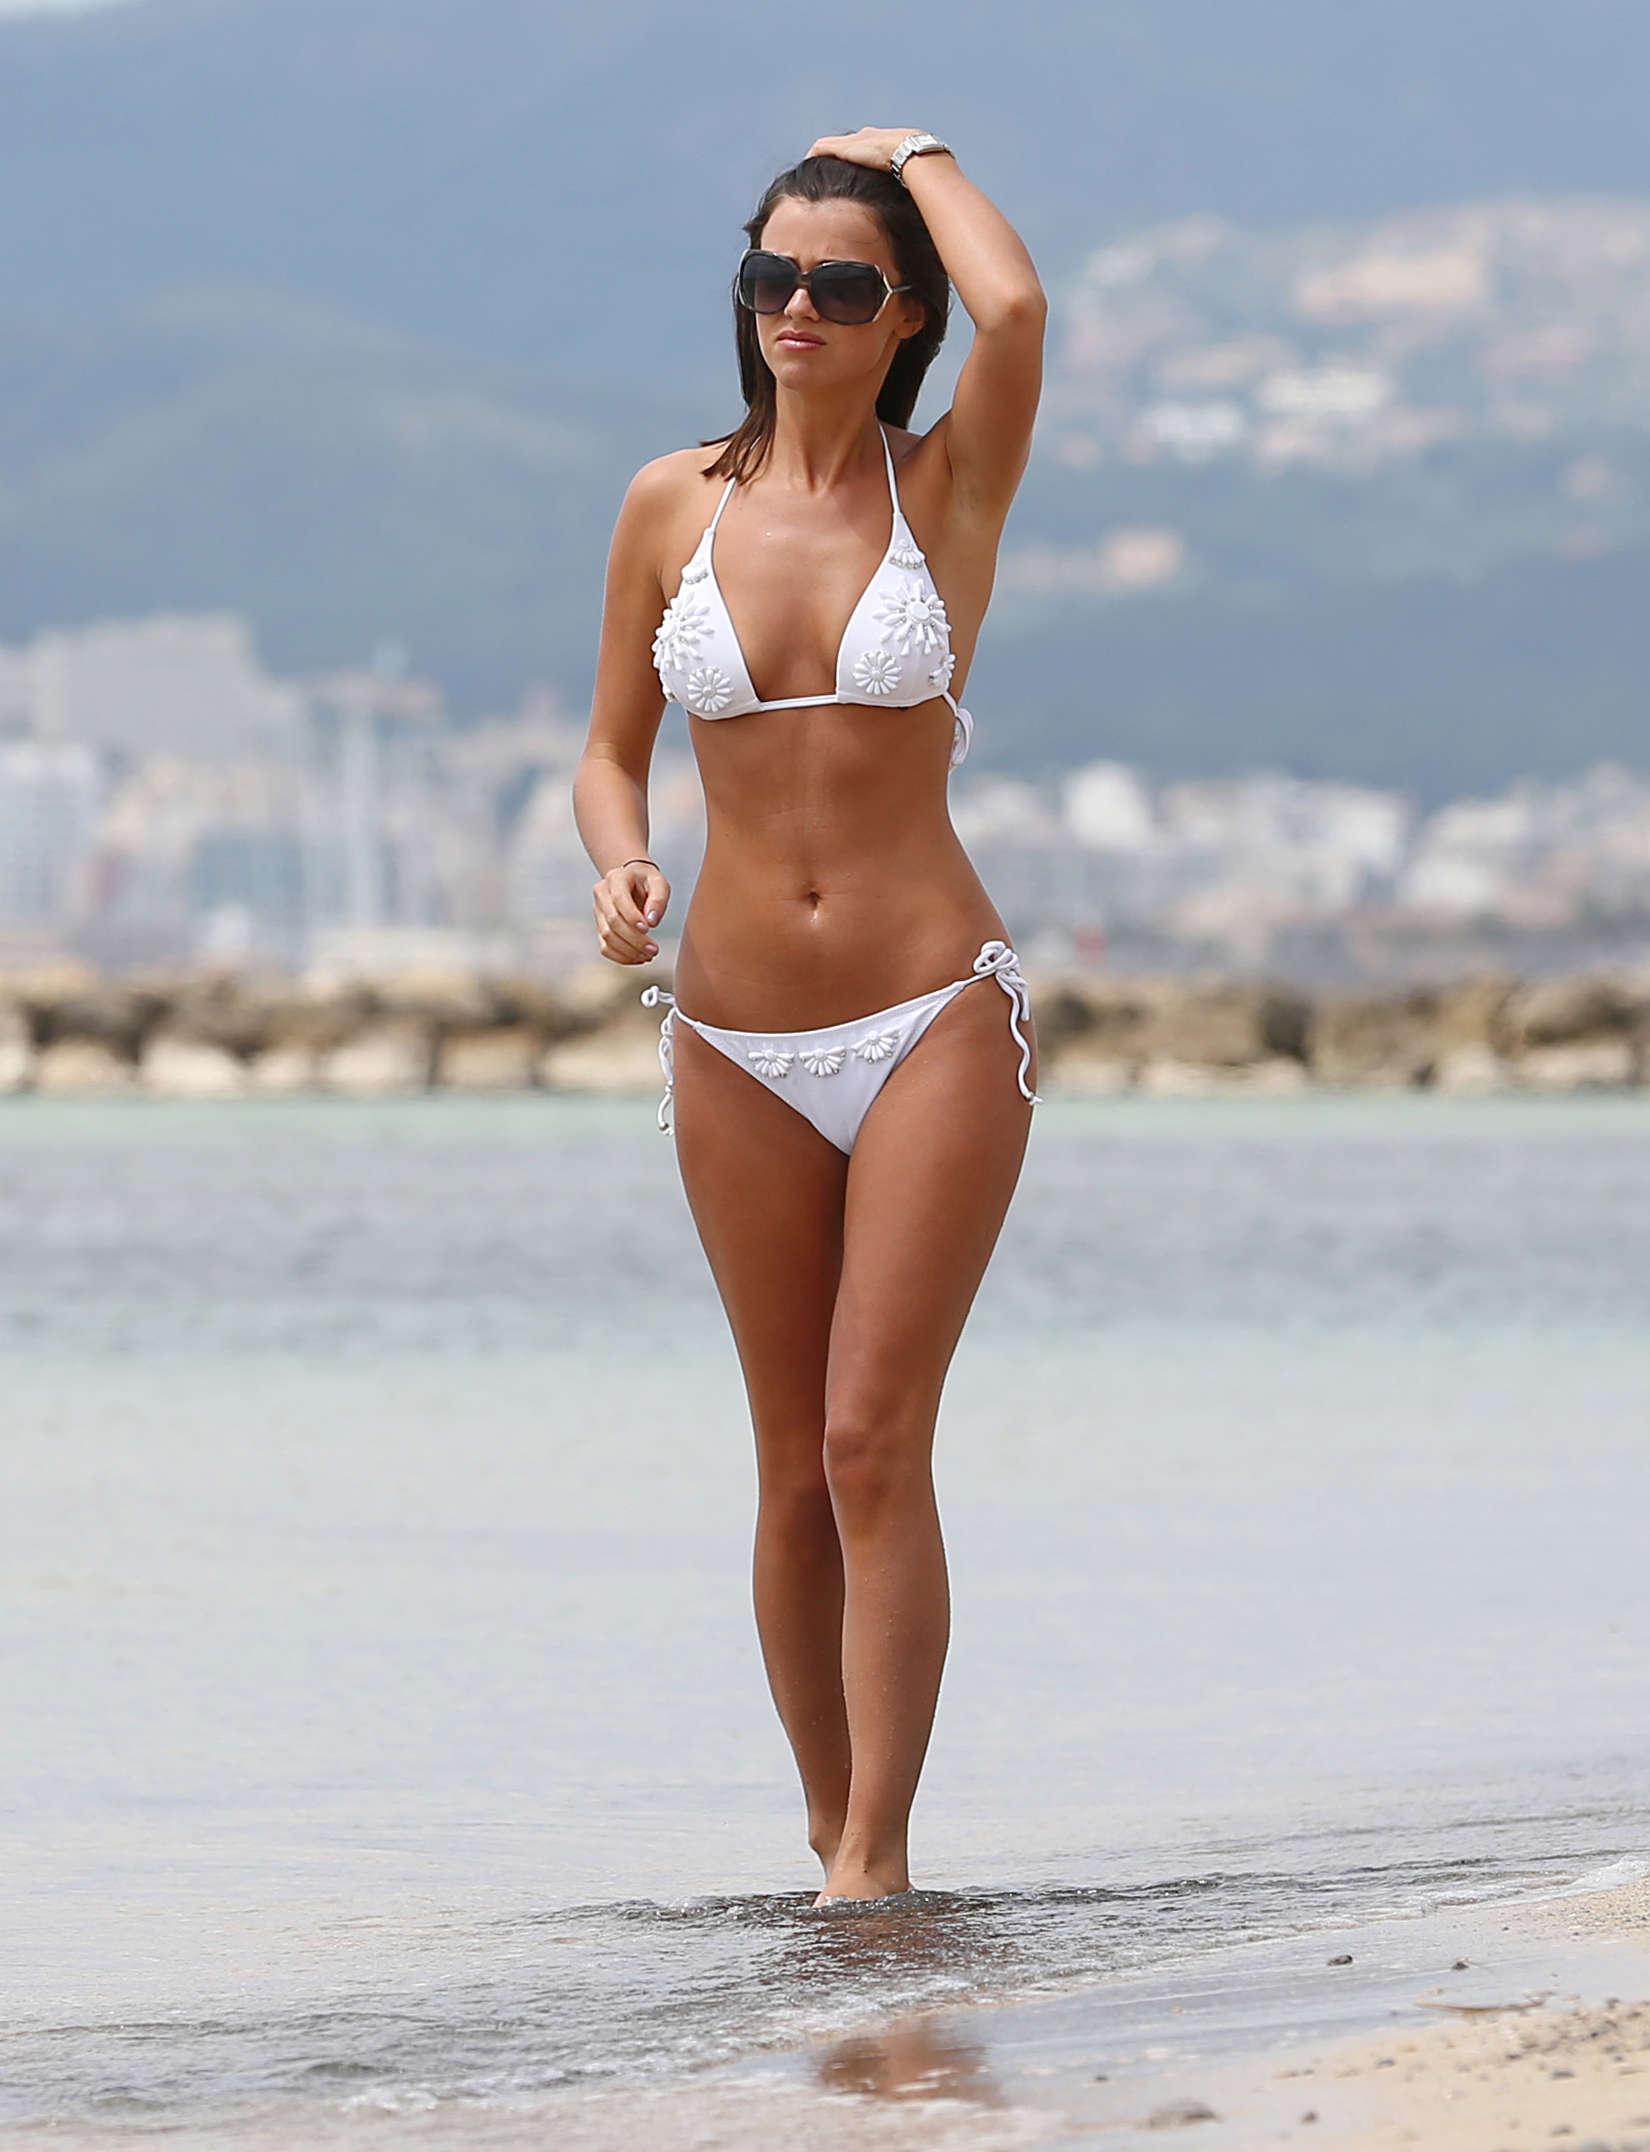 Lucy Mecklenburgh 2013 : Lucy Mecklenburgh White bikini candids in Mallorca – Spain -35